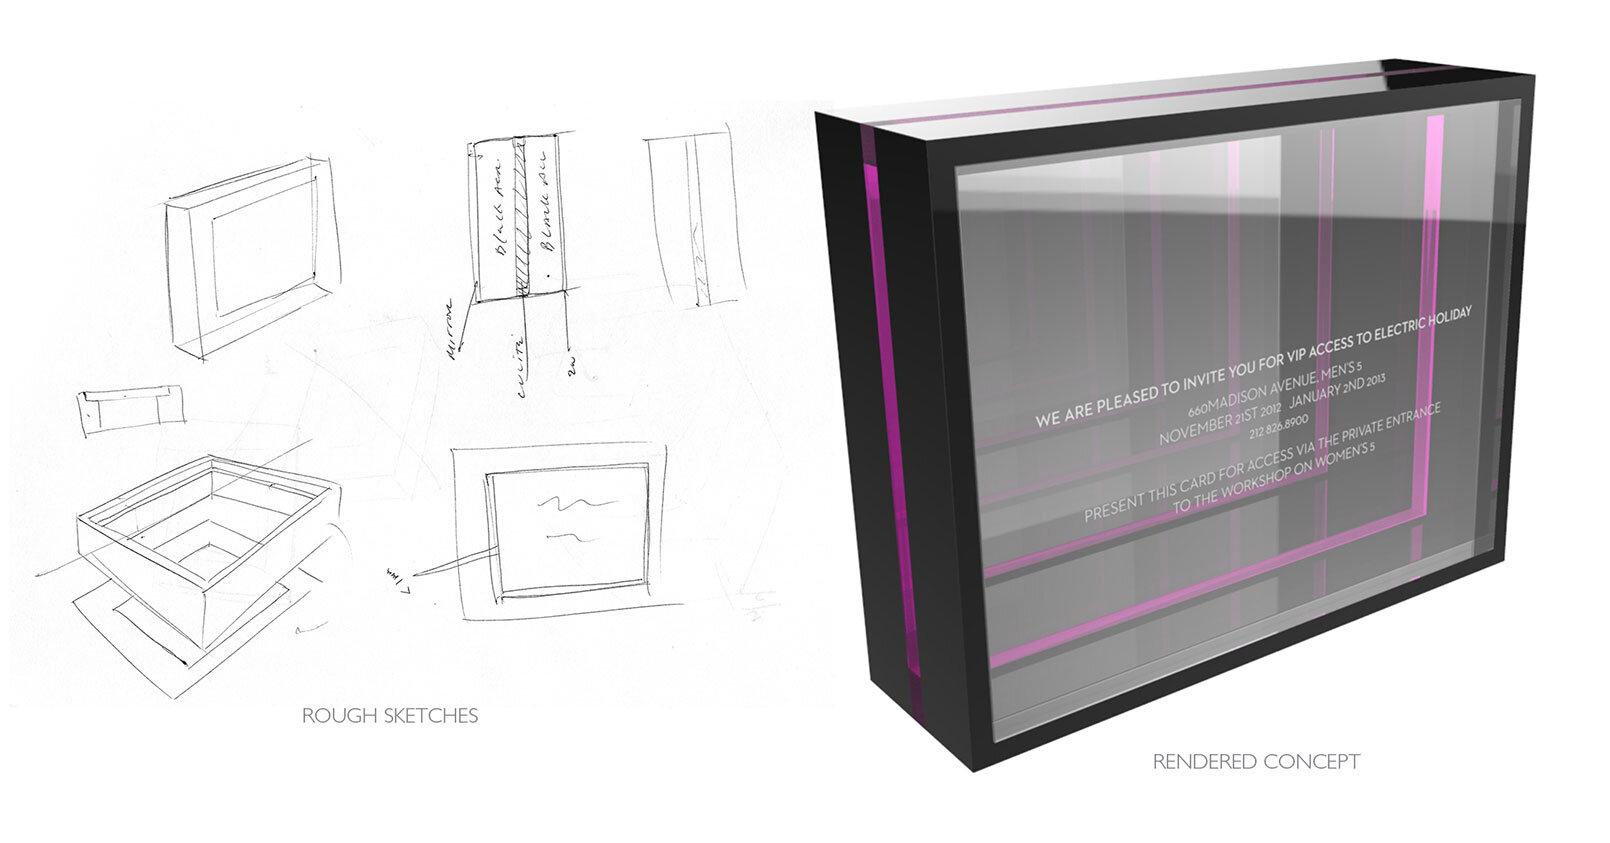 Barneys-New-York-Disney-Holiday-Packaging-Company-Design-4.JPG